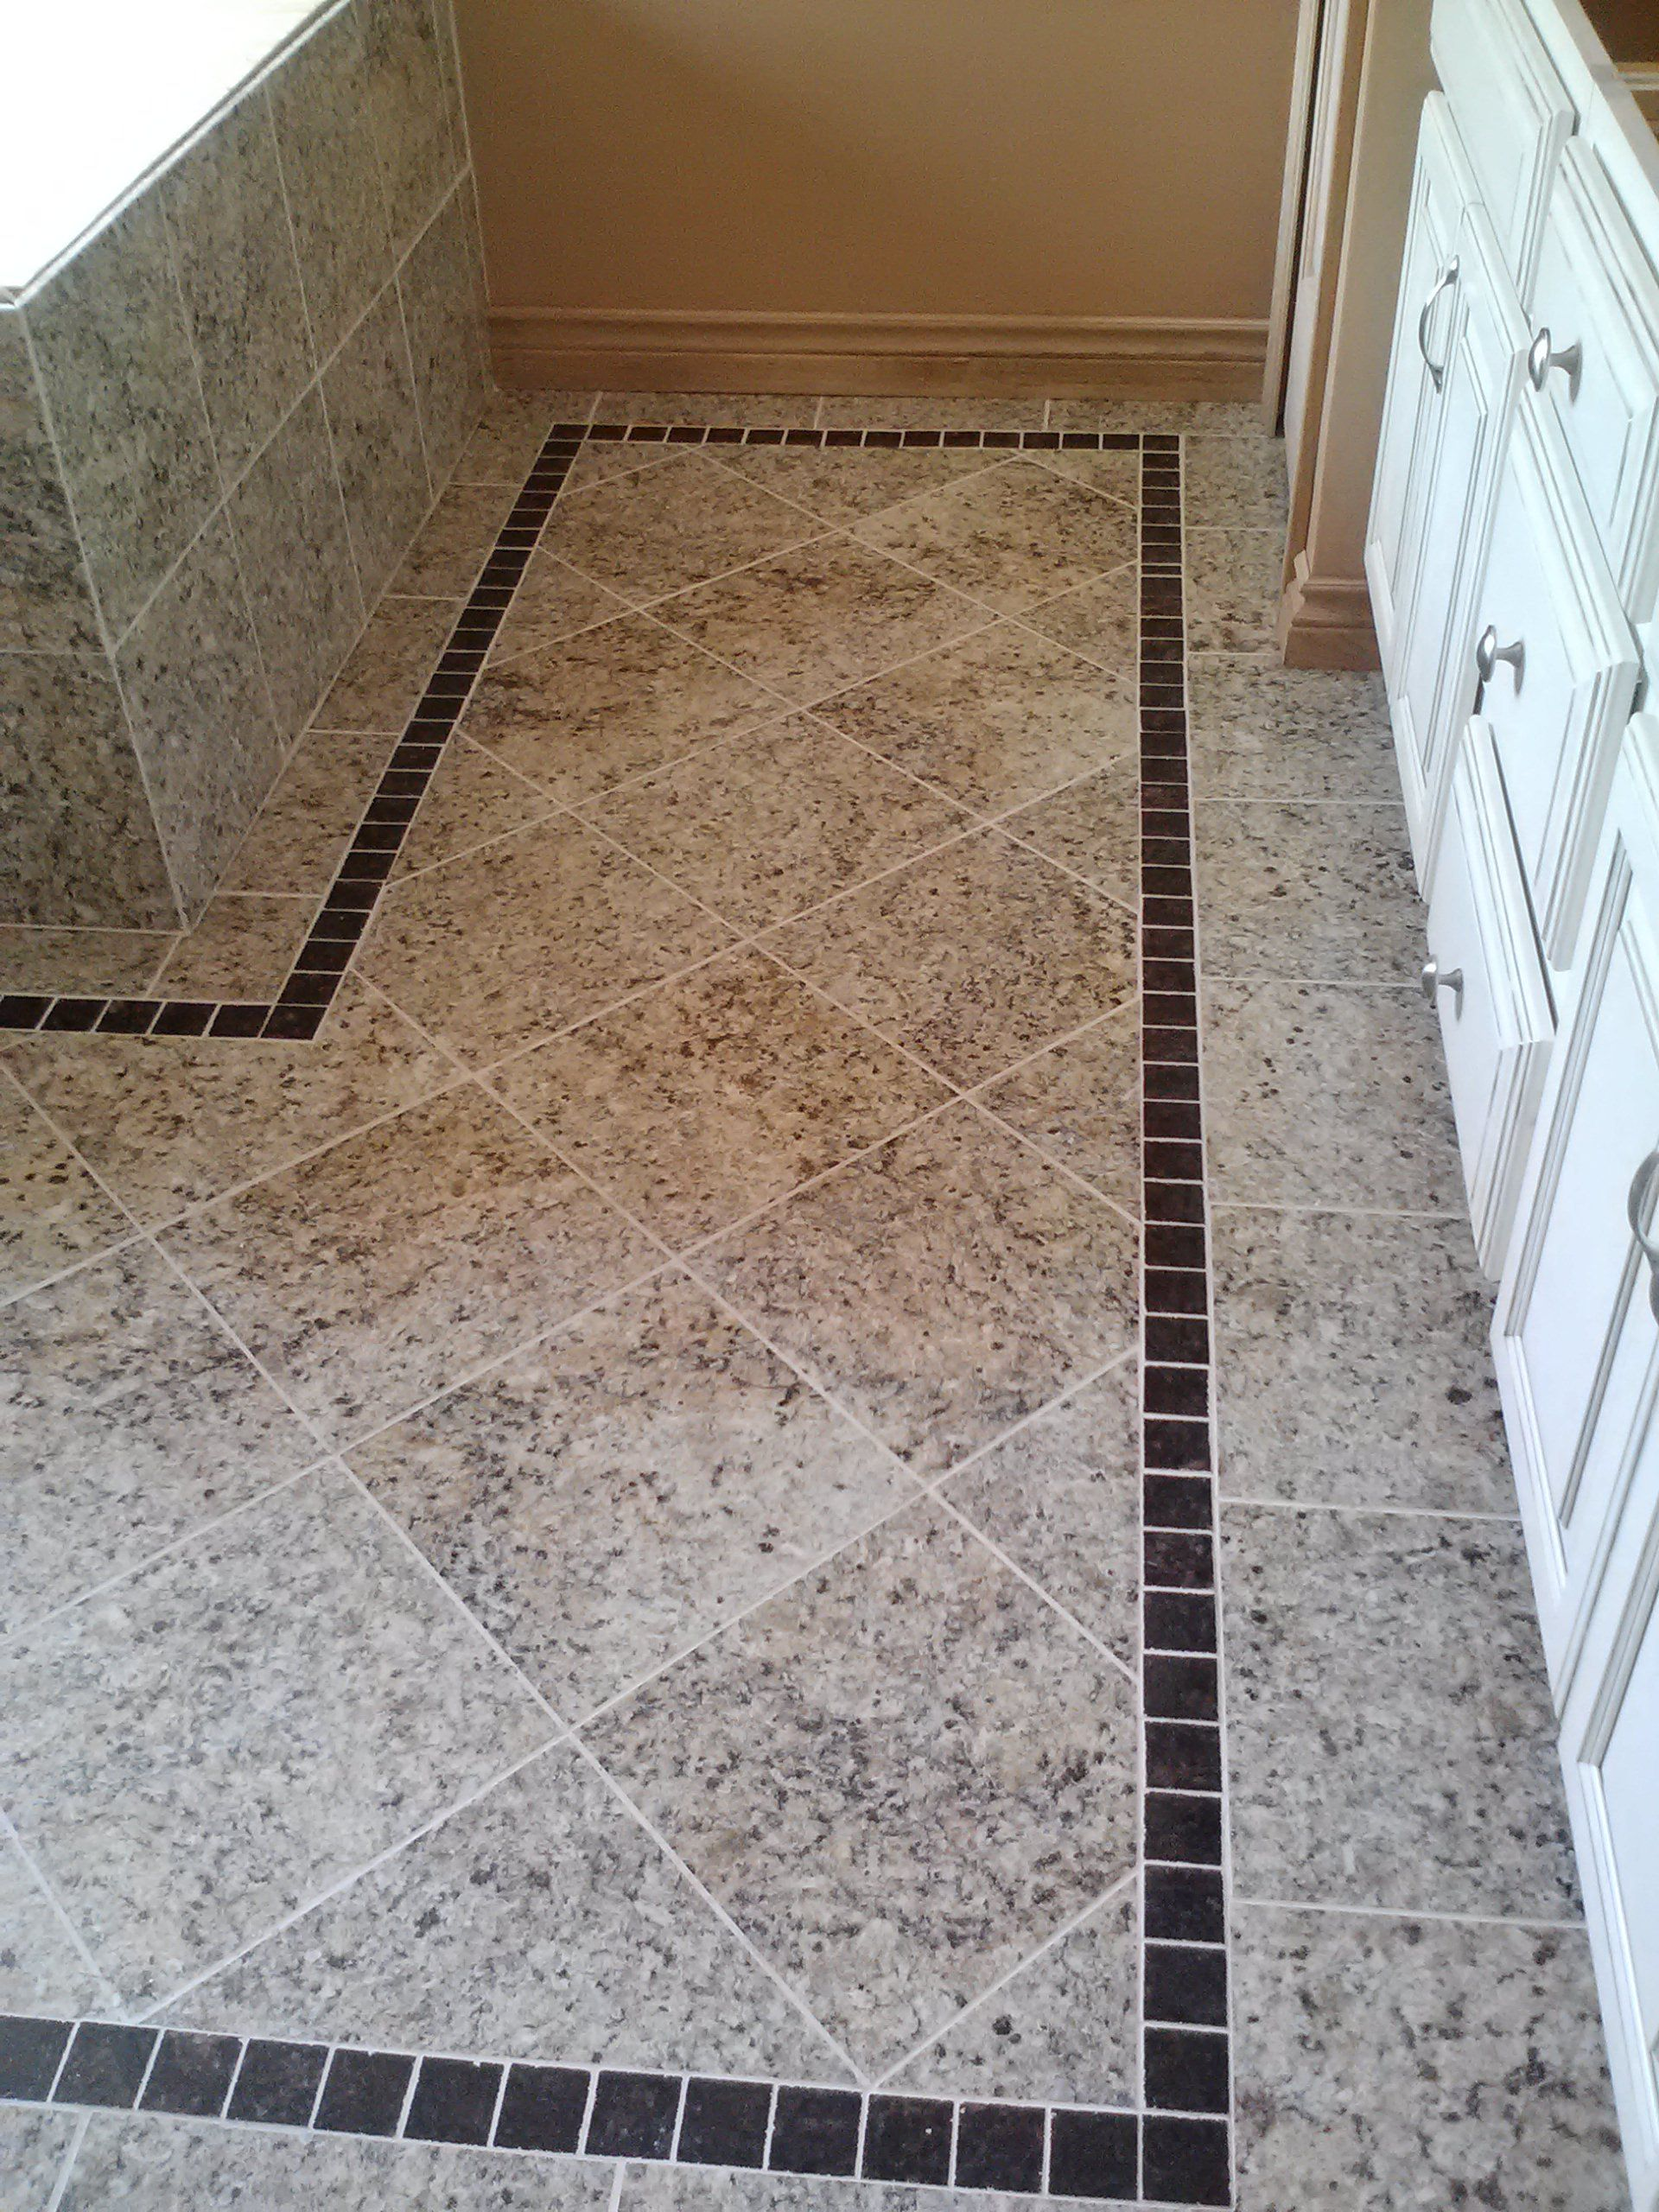 Border The Granite Flooring Granite Flooring Stone Flooring Entryway Flooring